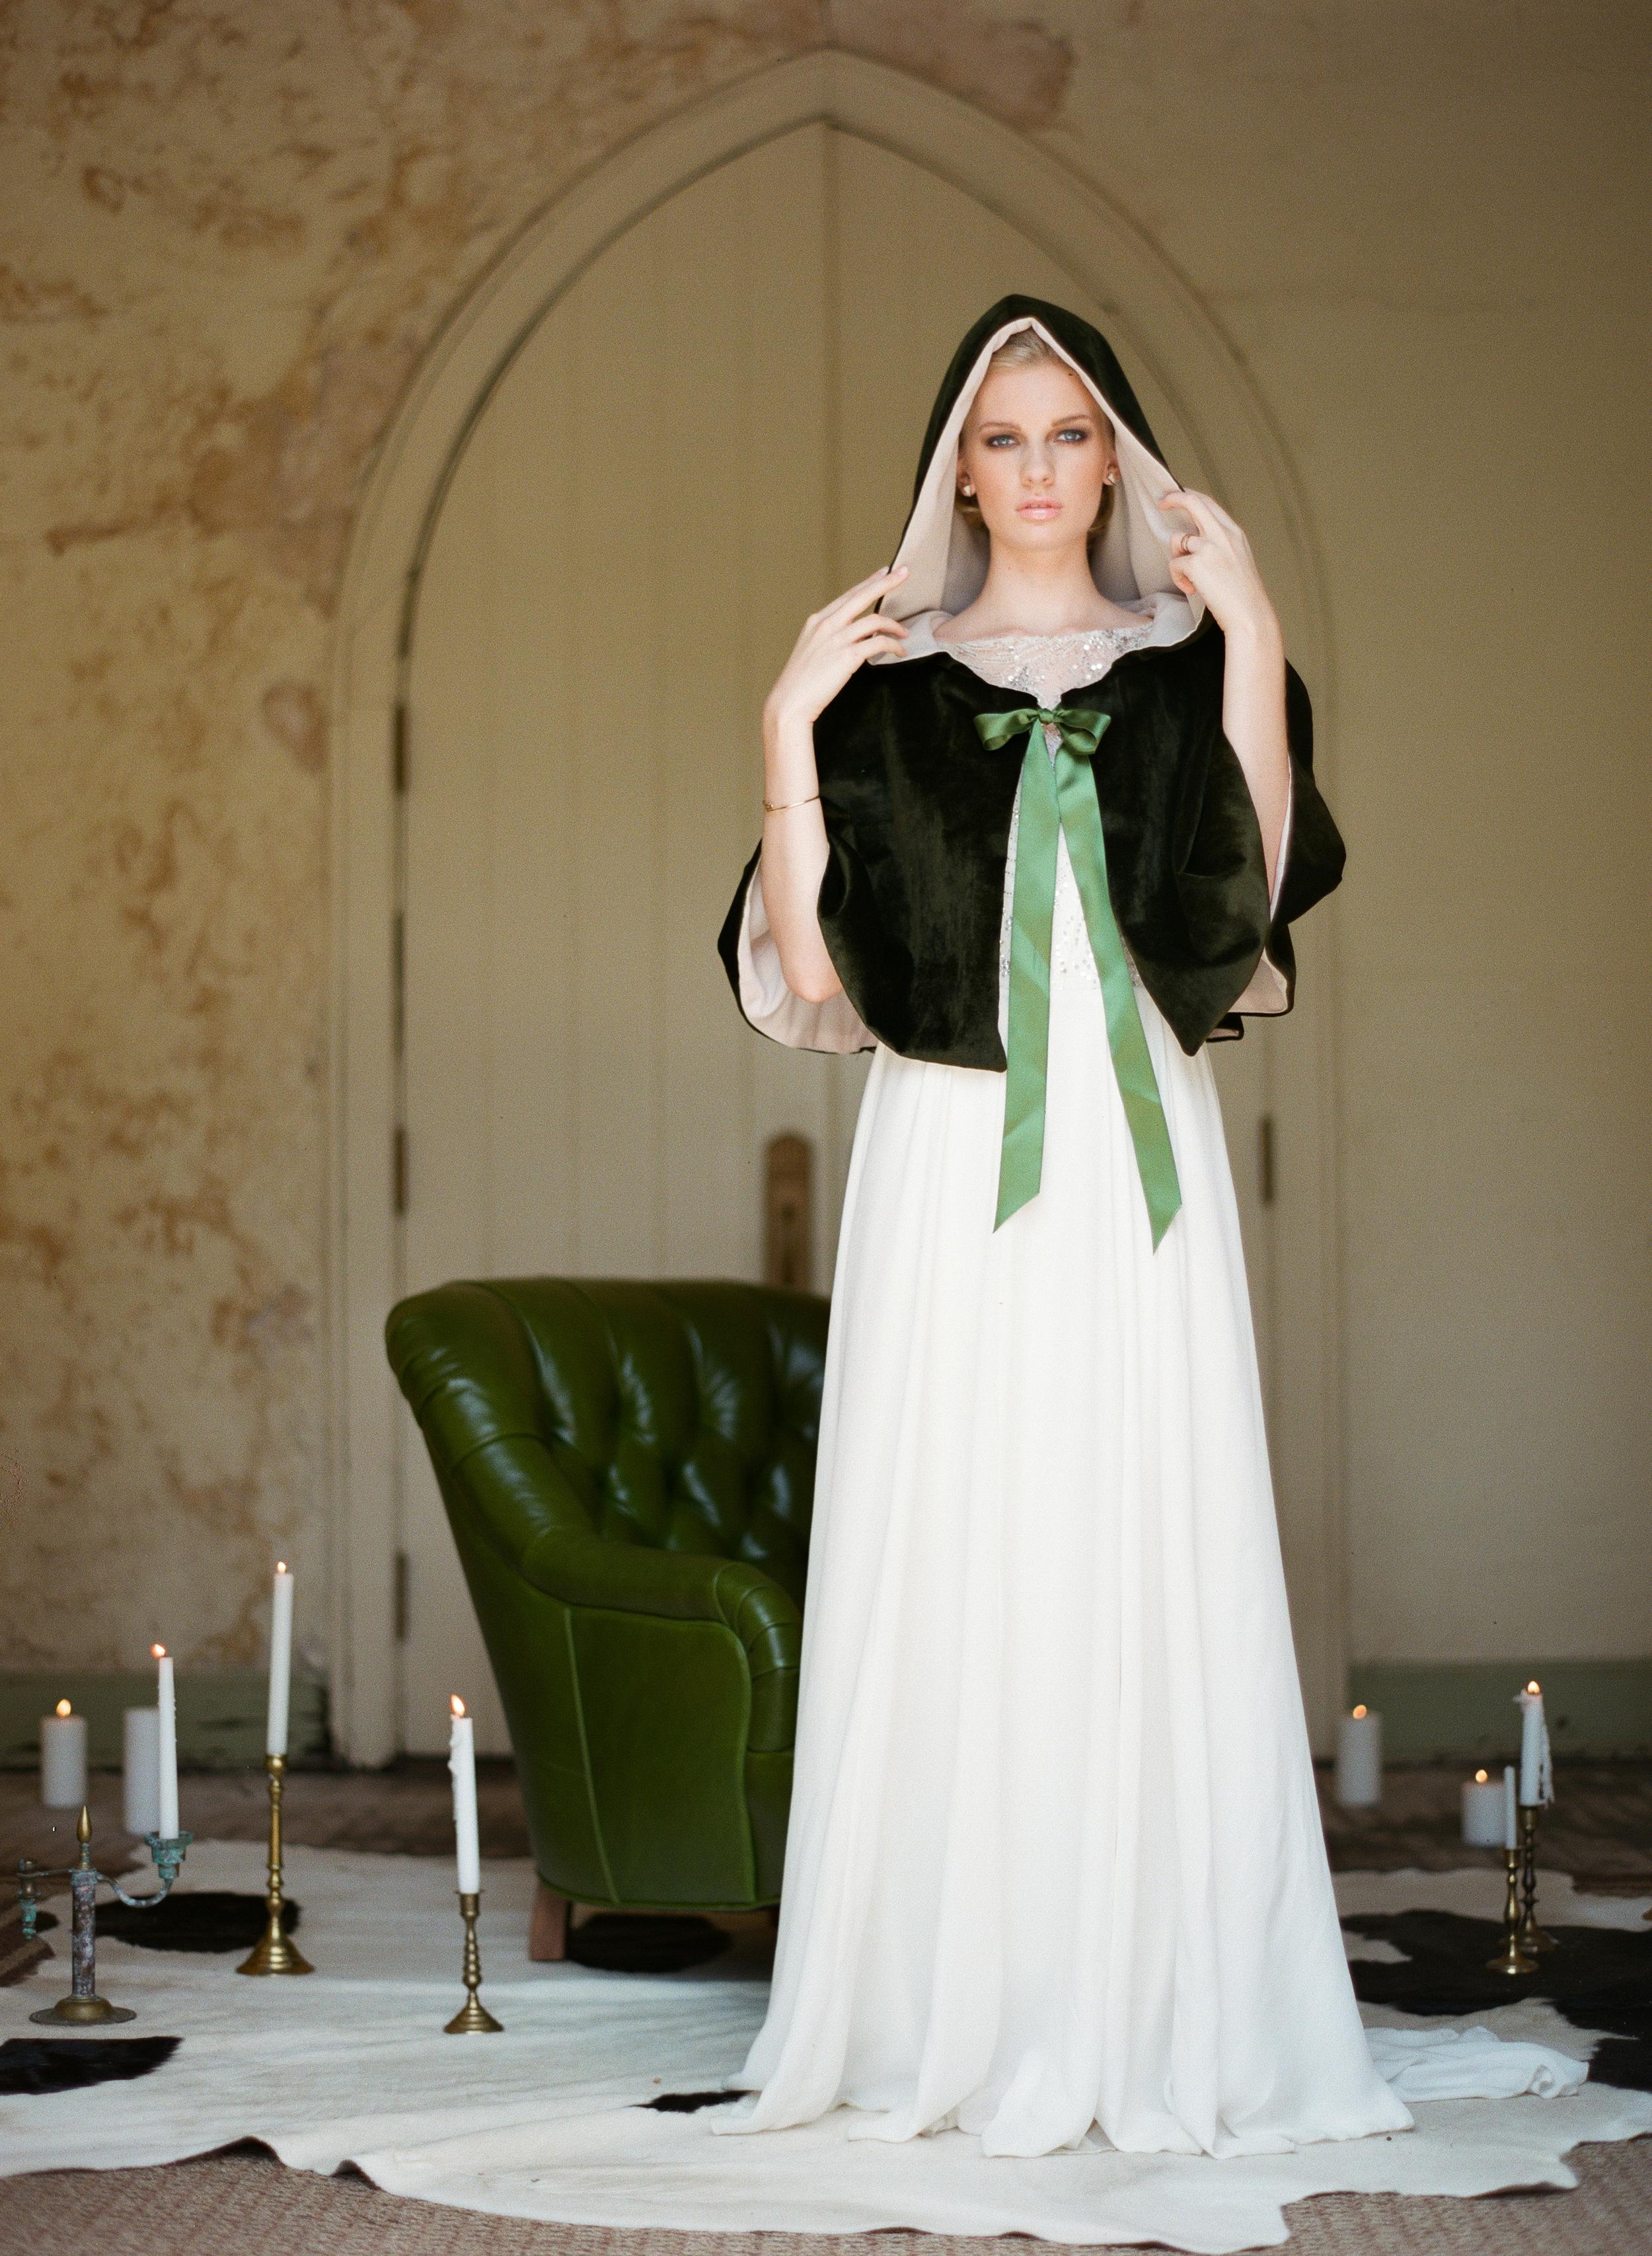 Olivia-Griffin-trendy-bride-magazine-willow-florals-sarah-seven-gwen-ivory-and-beau-bridal-boutique-savannah-wedding-dresses-savannah-bridal-boutique-savannah-wedding-savannah-bridal-gowns-savannah-wedding-planner-georgia-bridal-boutique-9.JPG